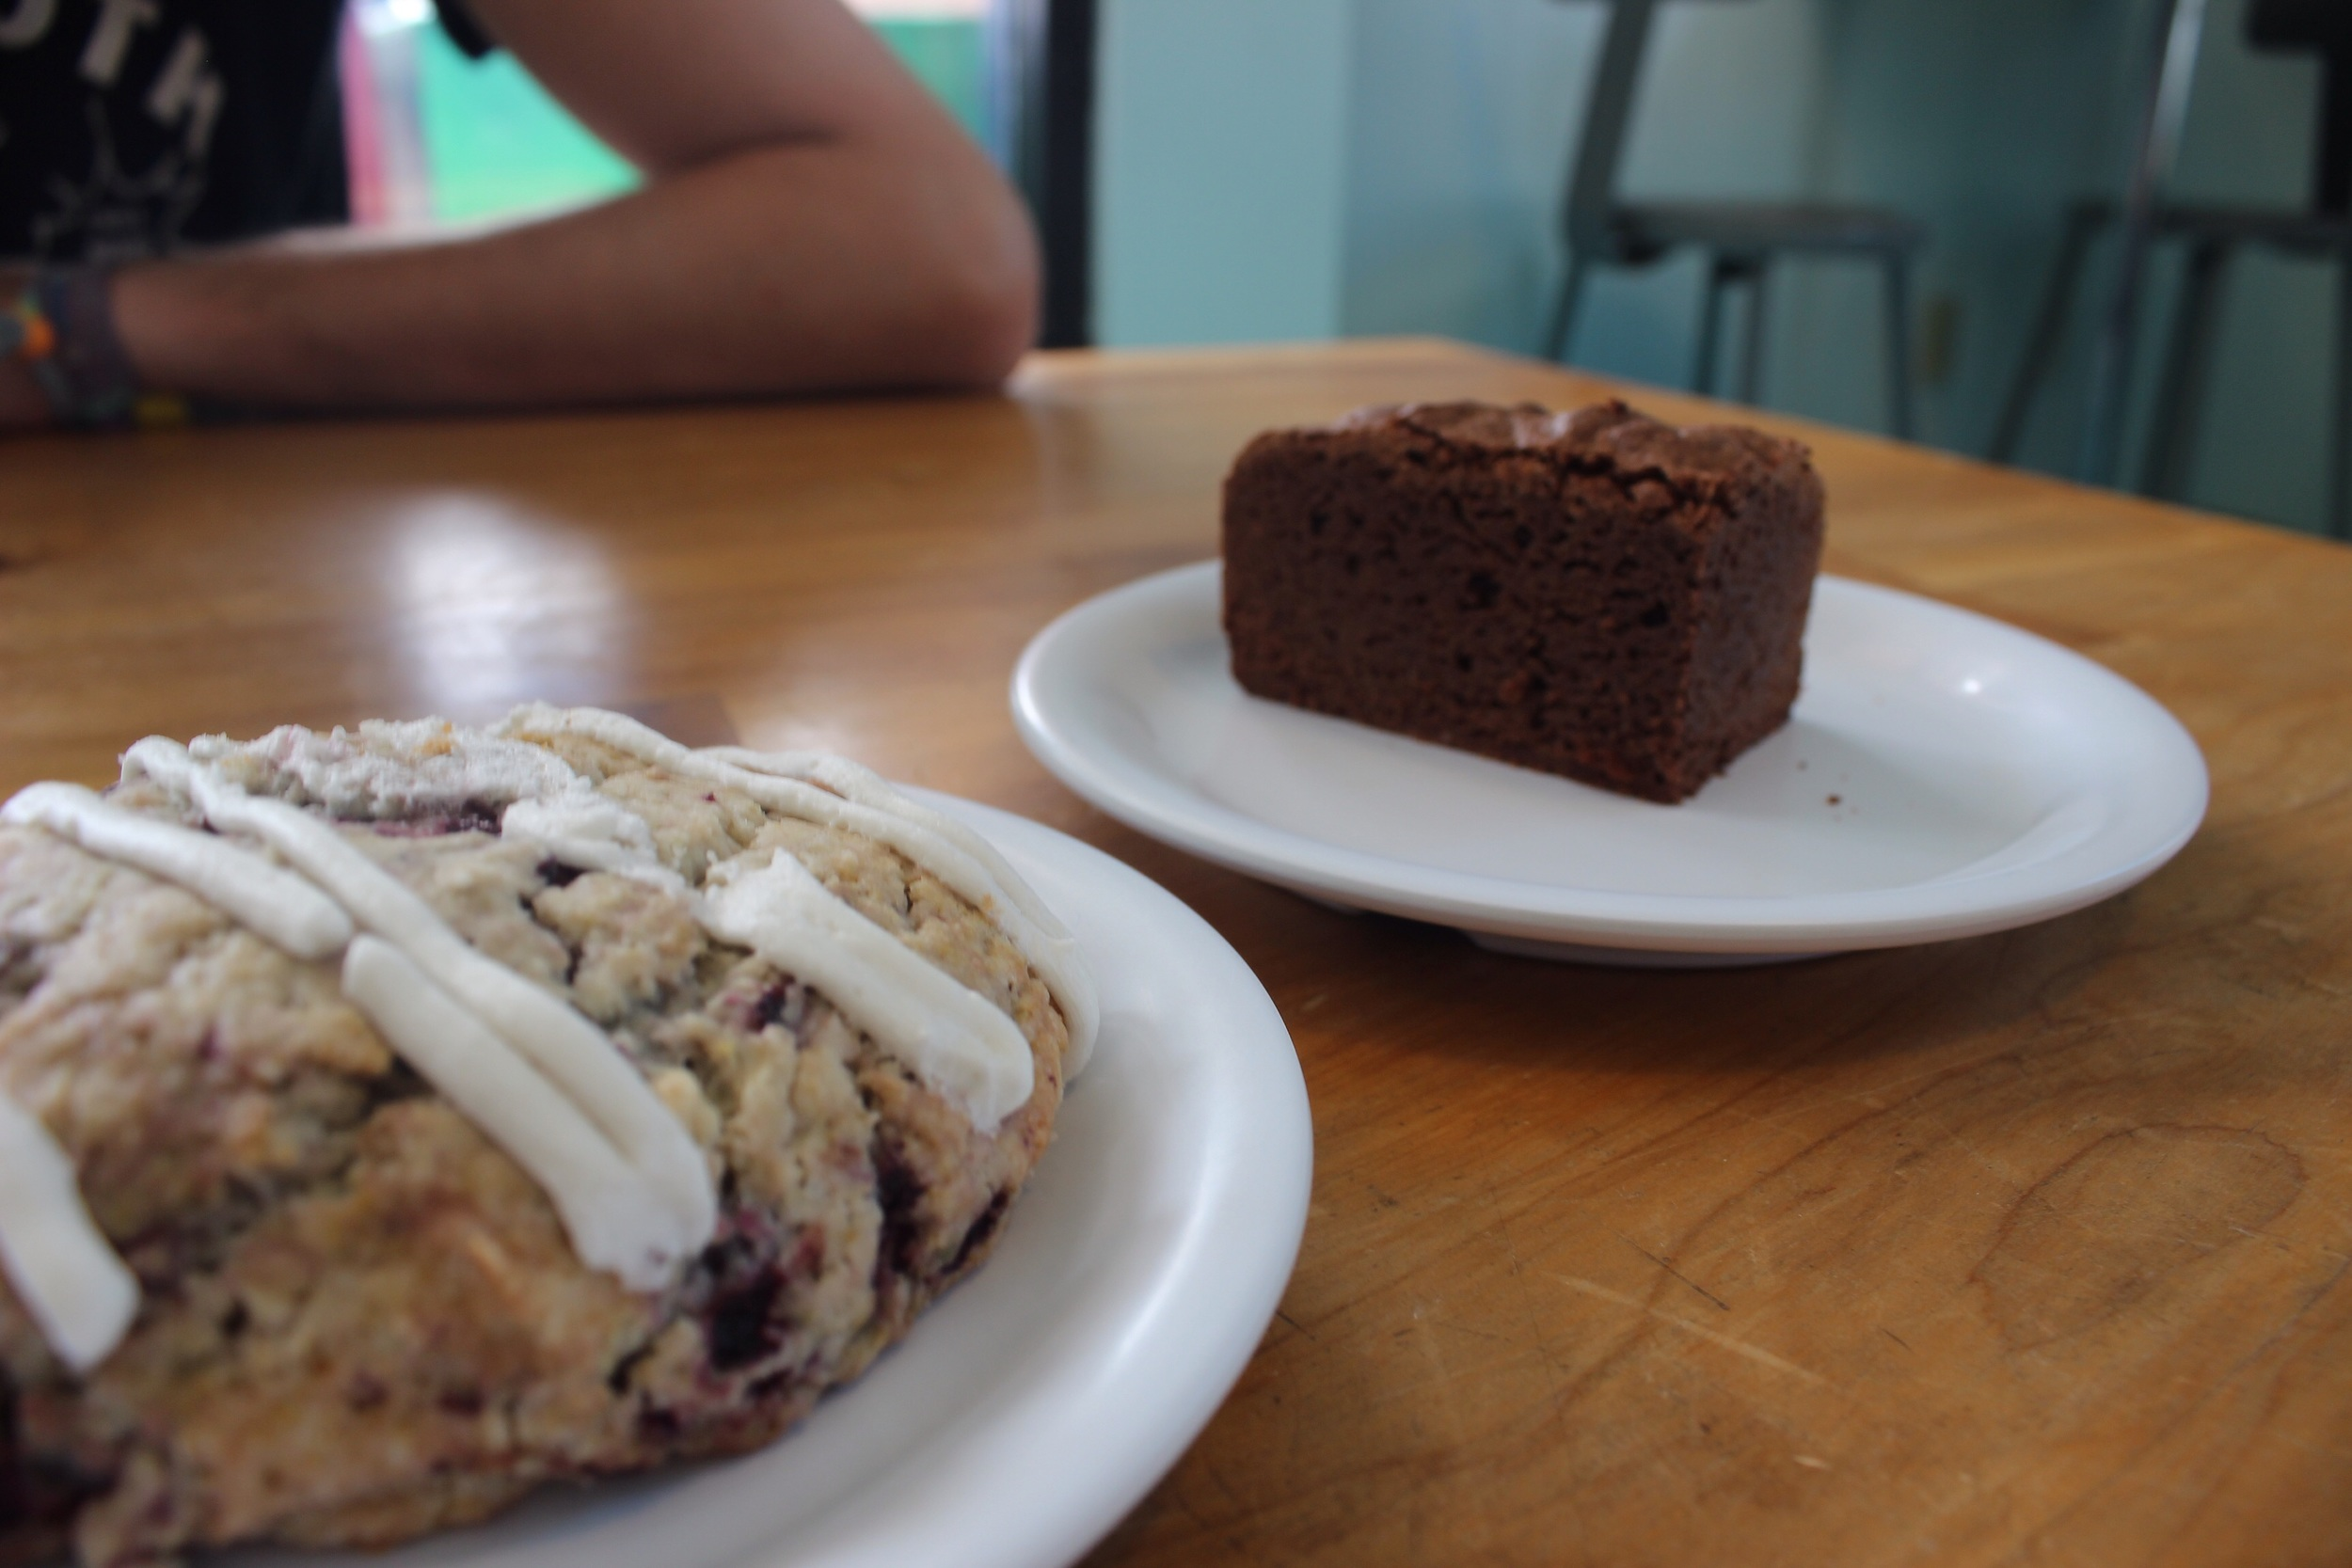 Cherry chocolate scone and brownie 100% gluten free